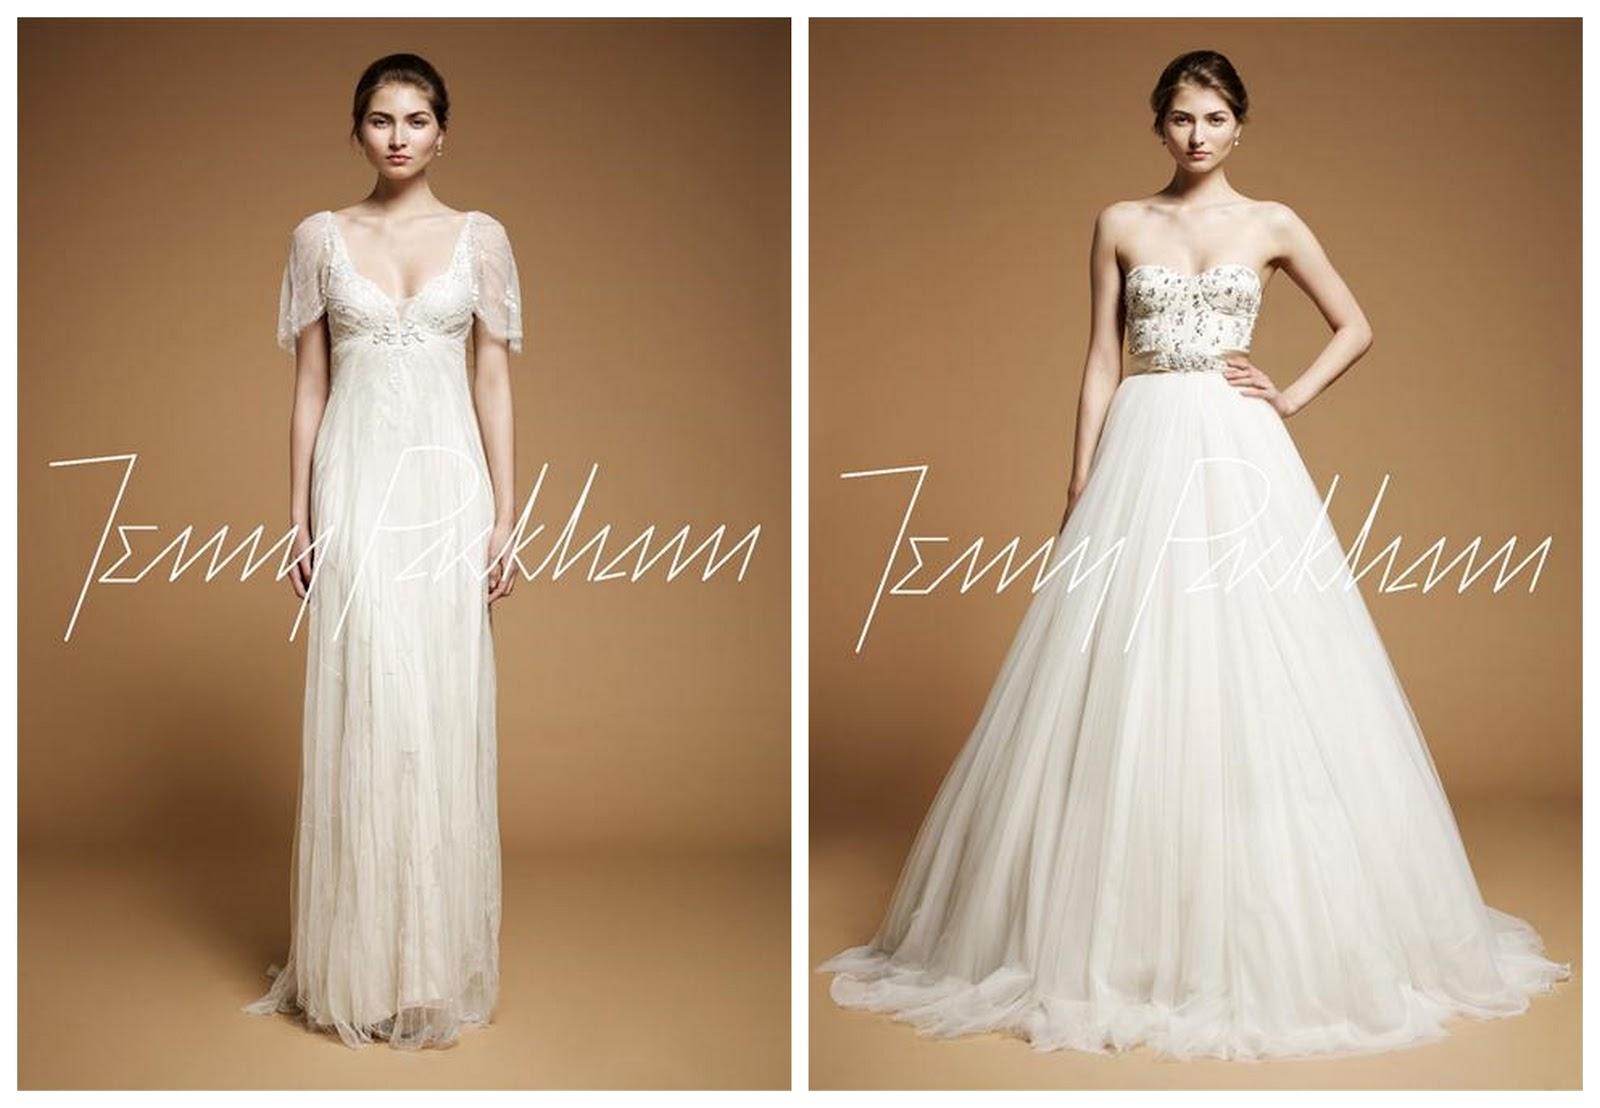 Preloved wedding dresses uk wedding ideas wedding dresses for 2nd hand ombrellifo Choice Image